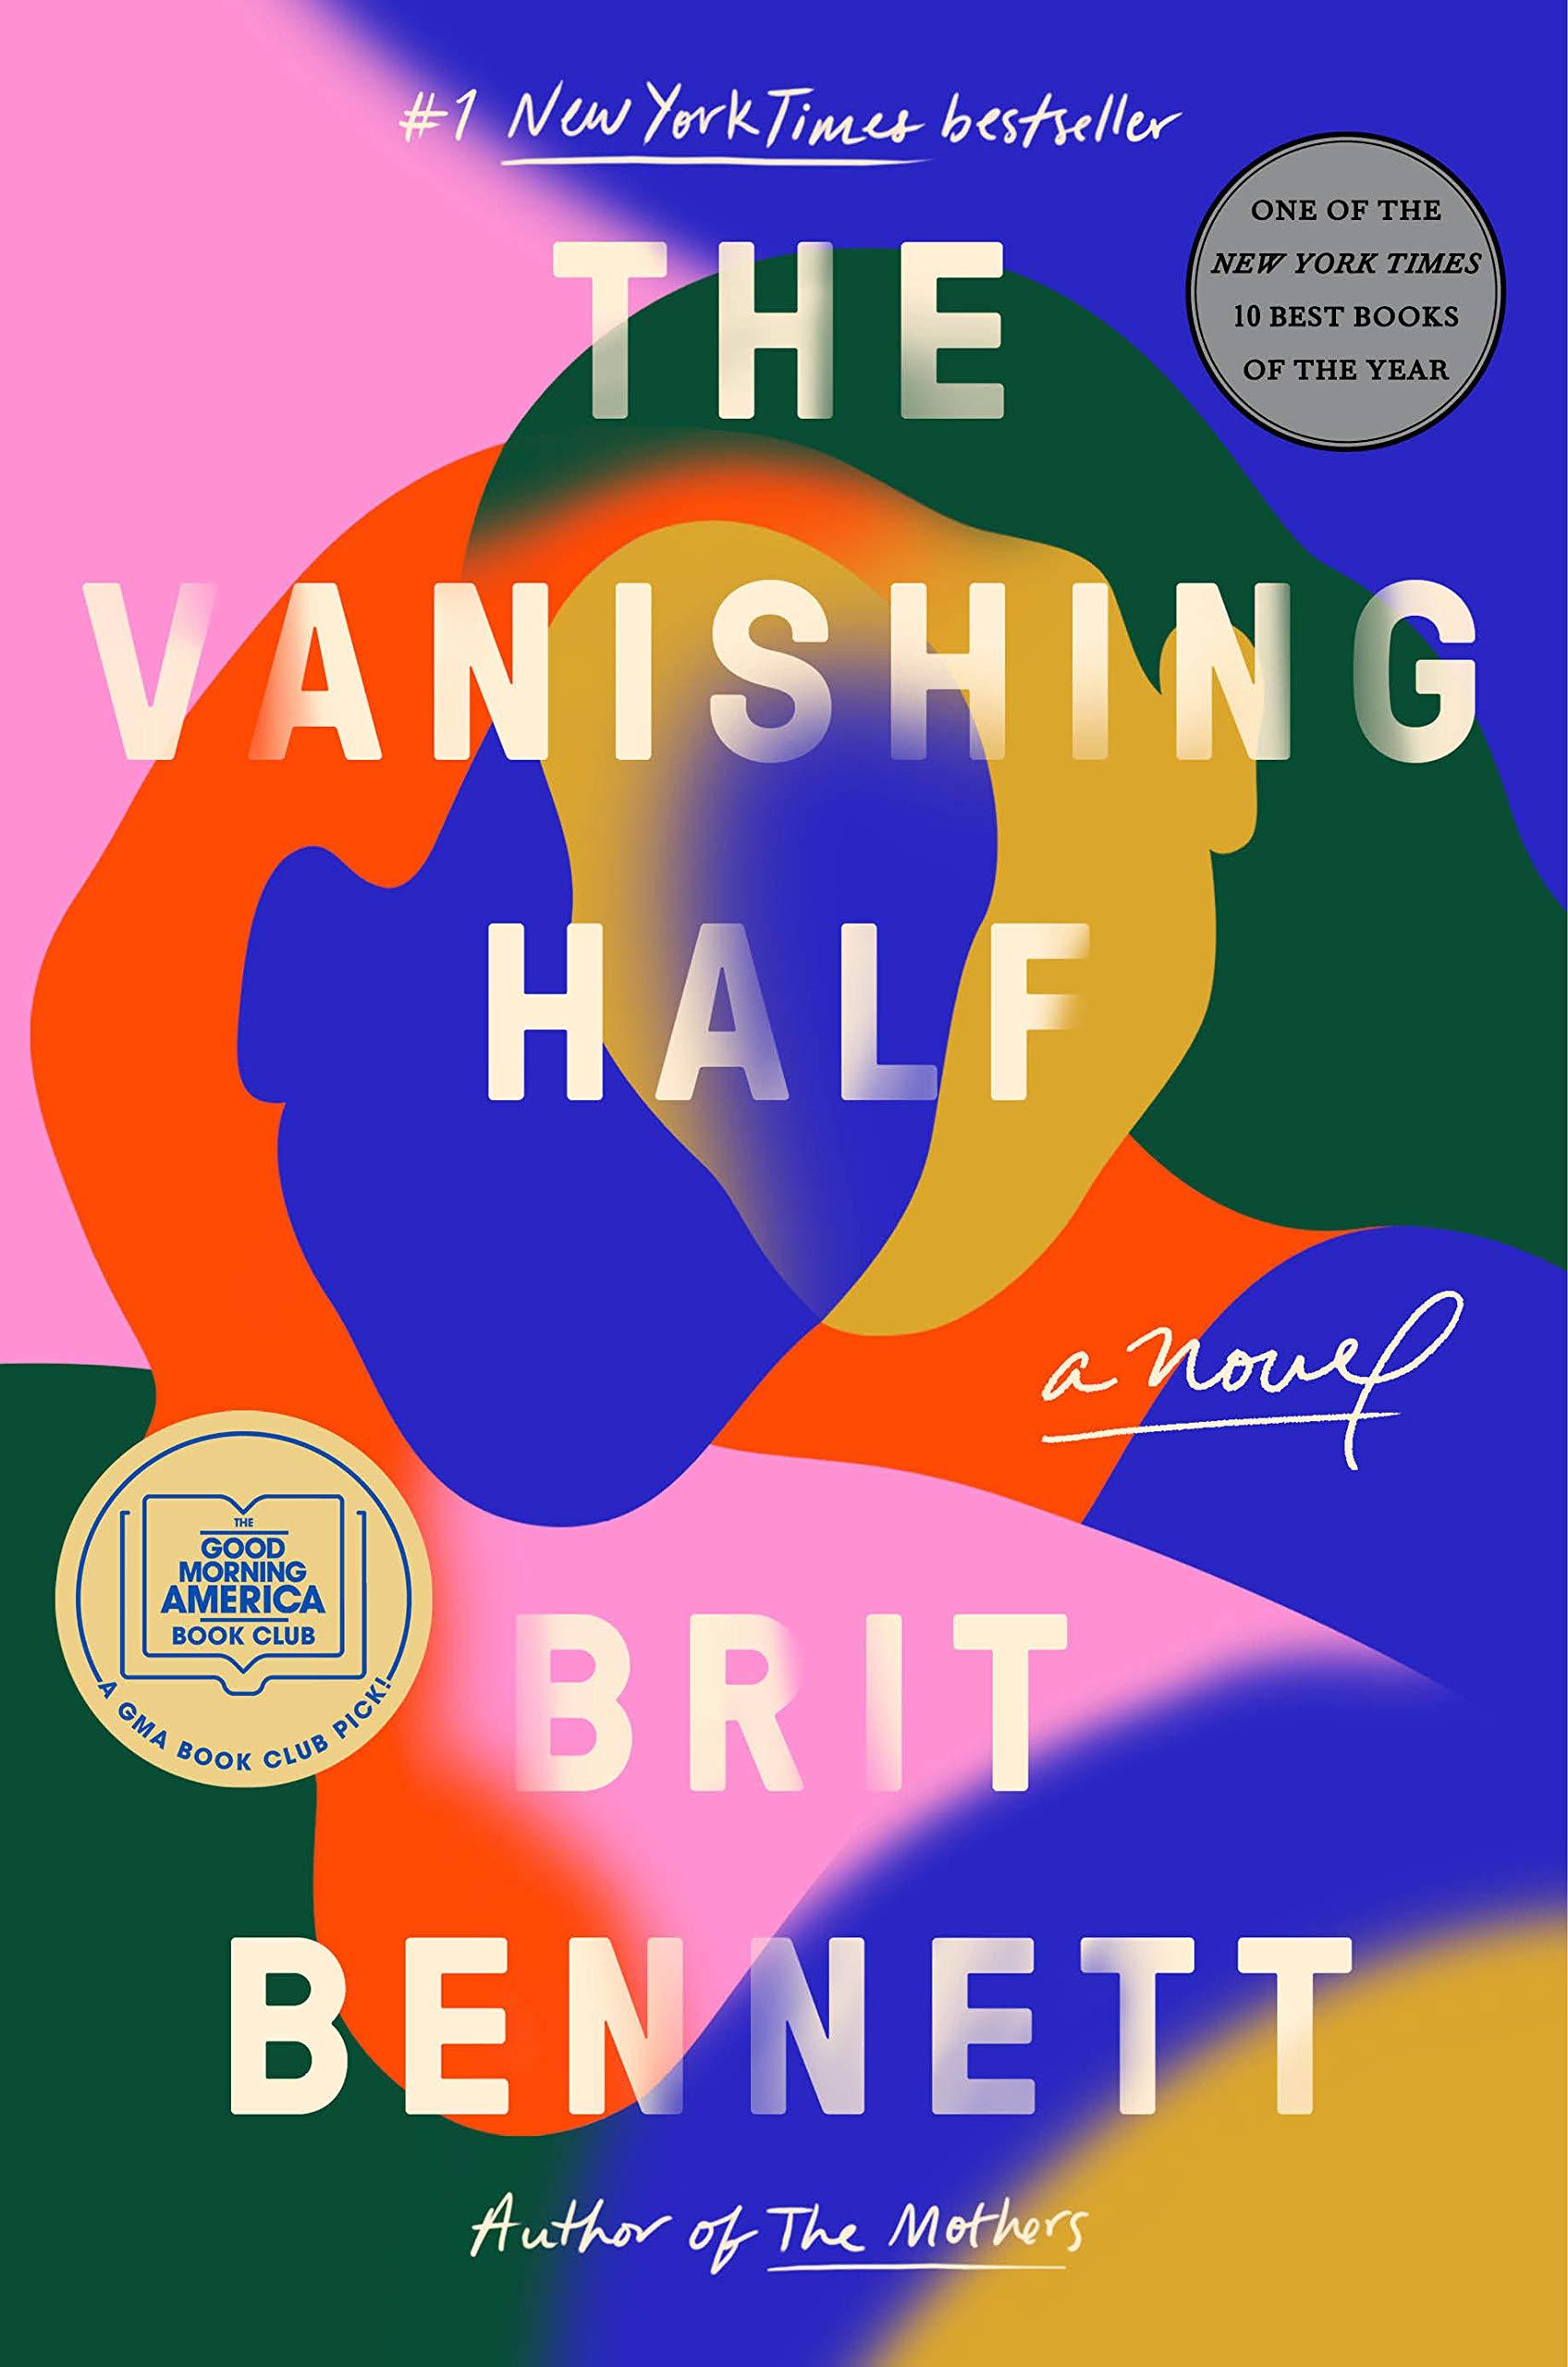 book cover of The vanishing half